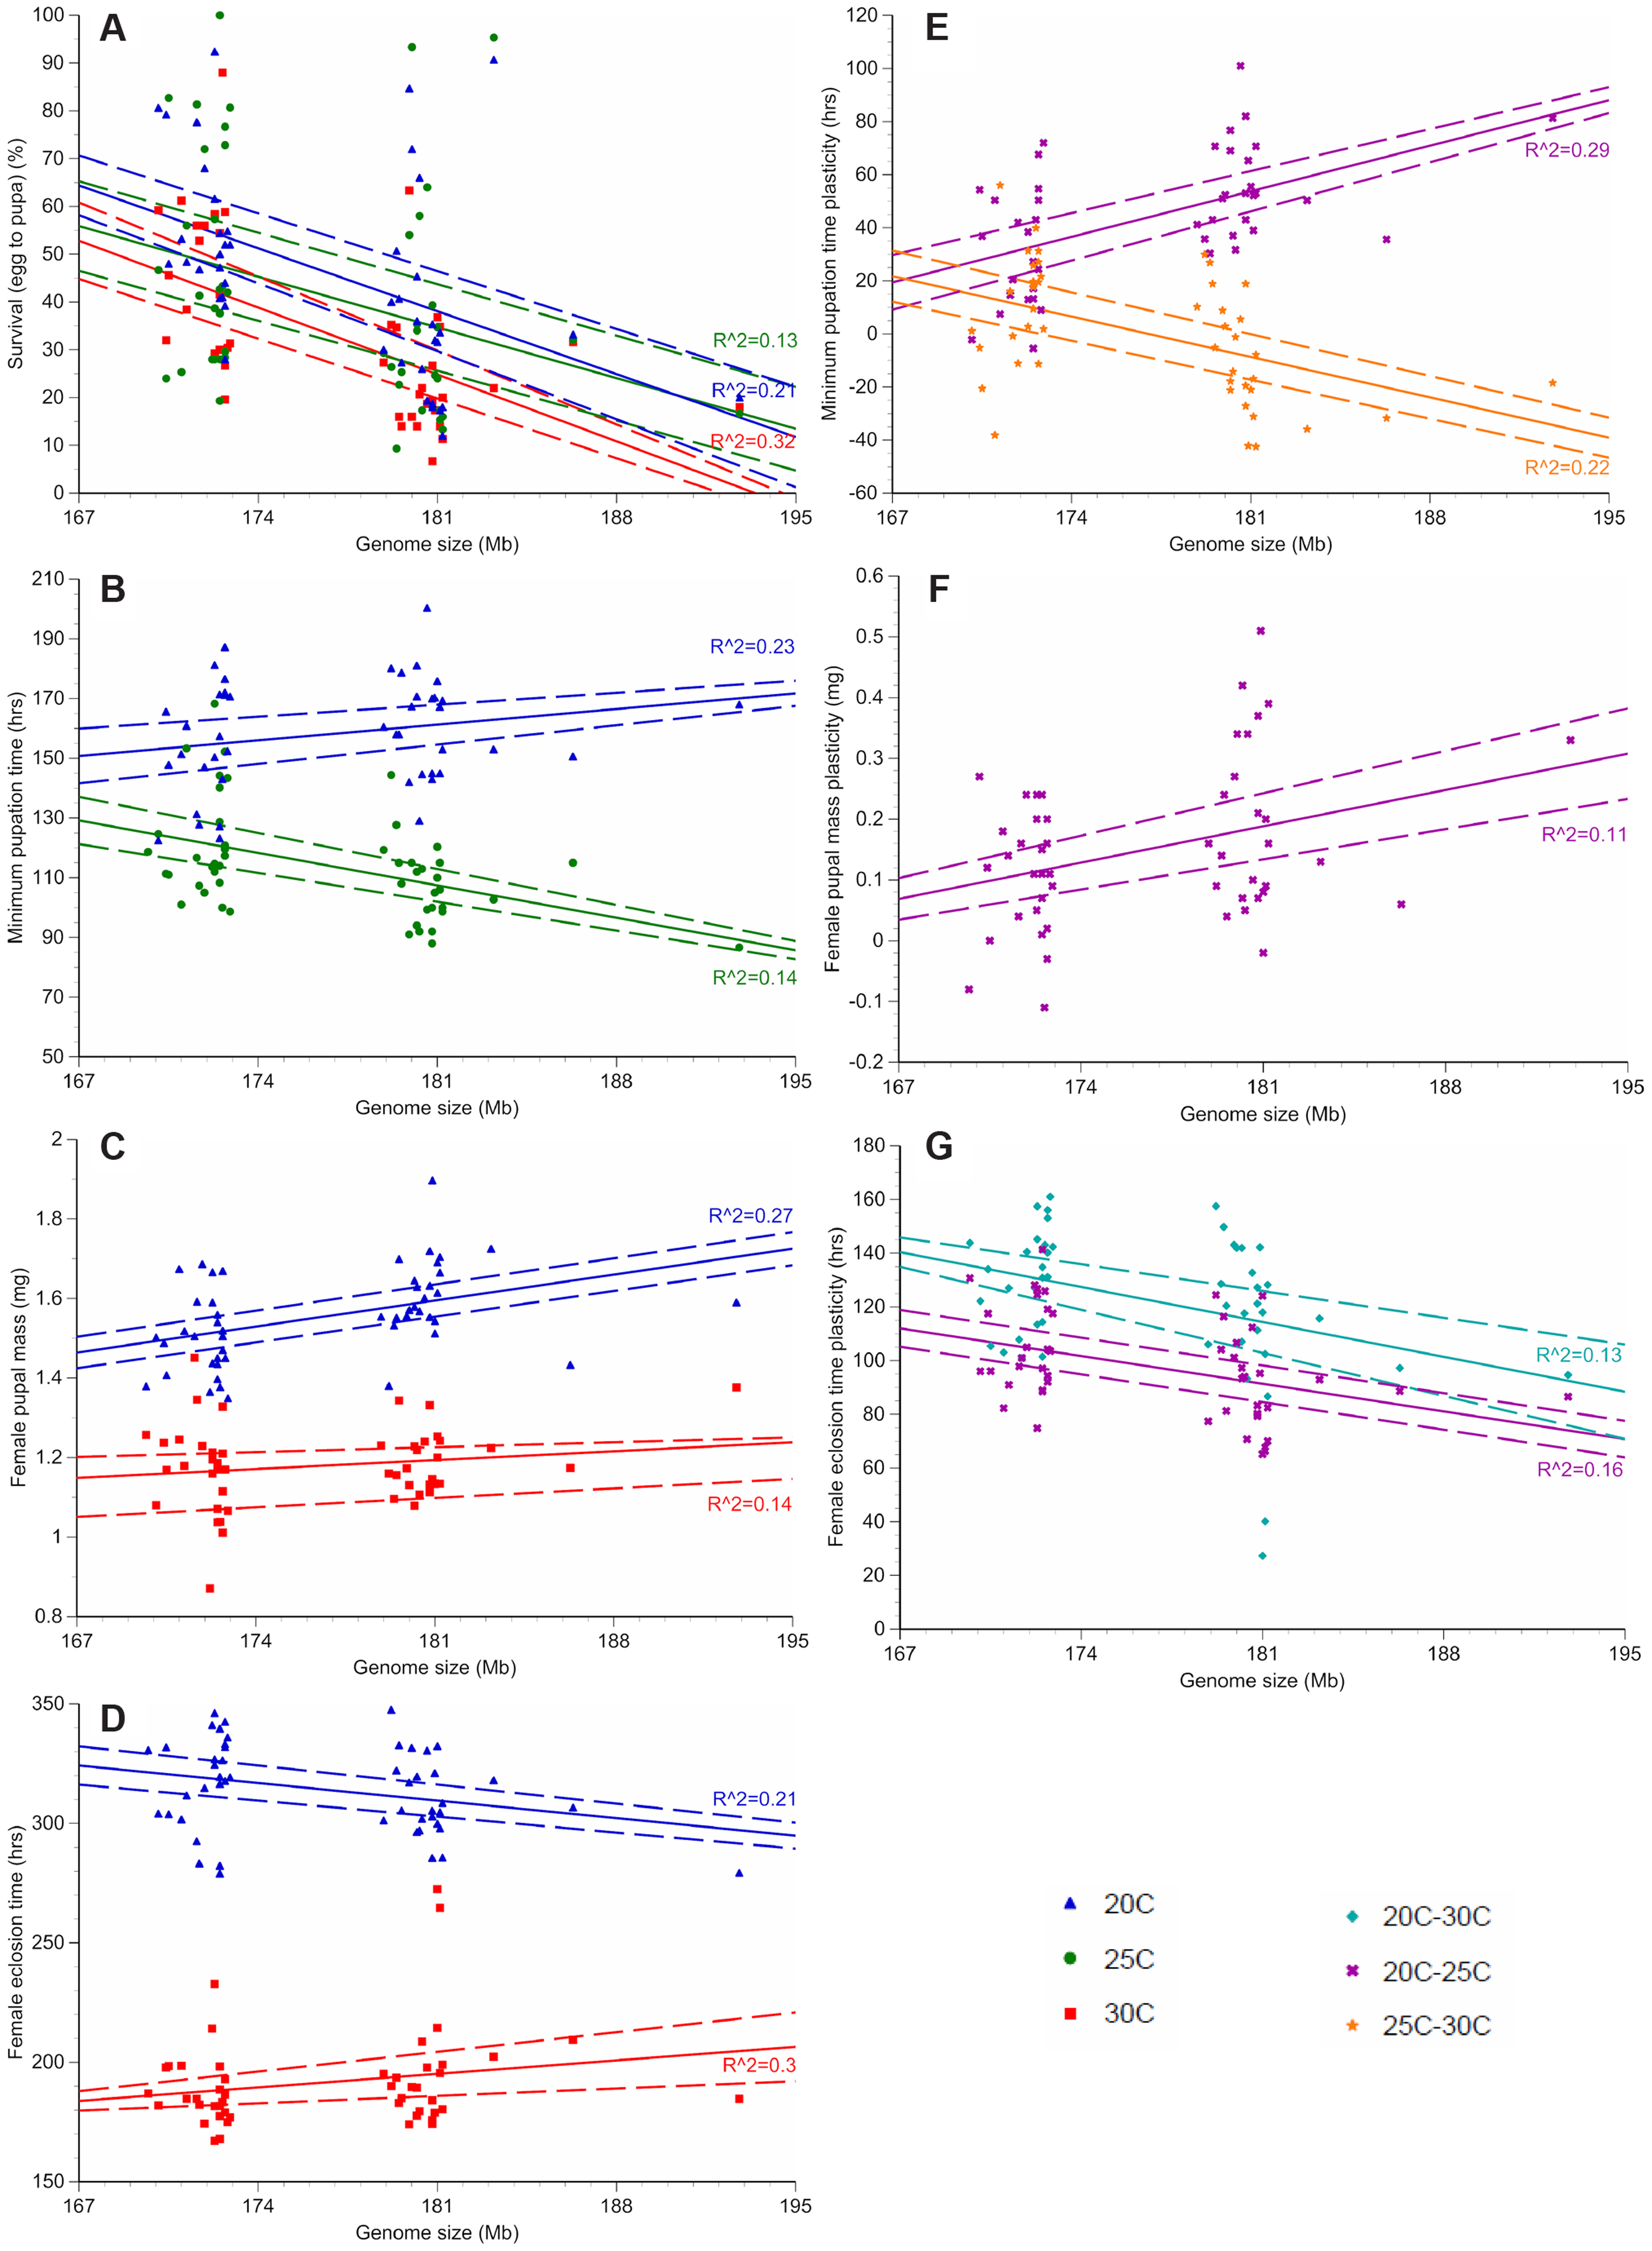 Genome size and temperature affect <i>D. melanogaster</i> development and plasticity.